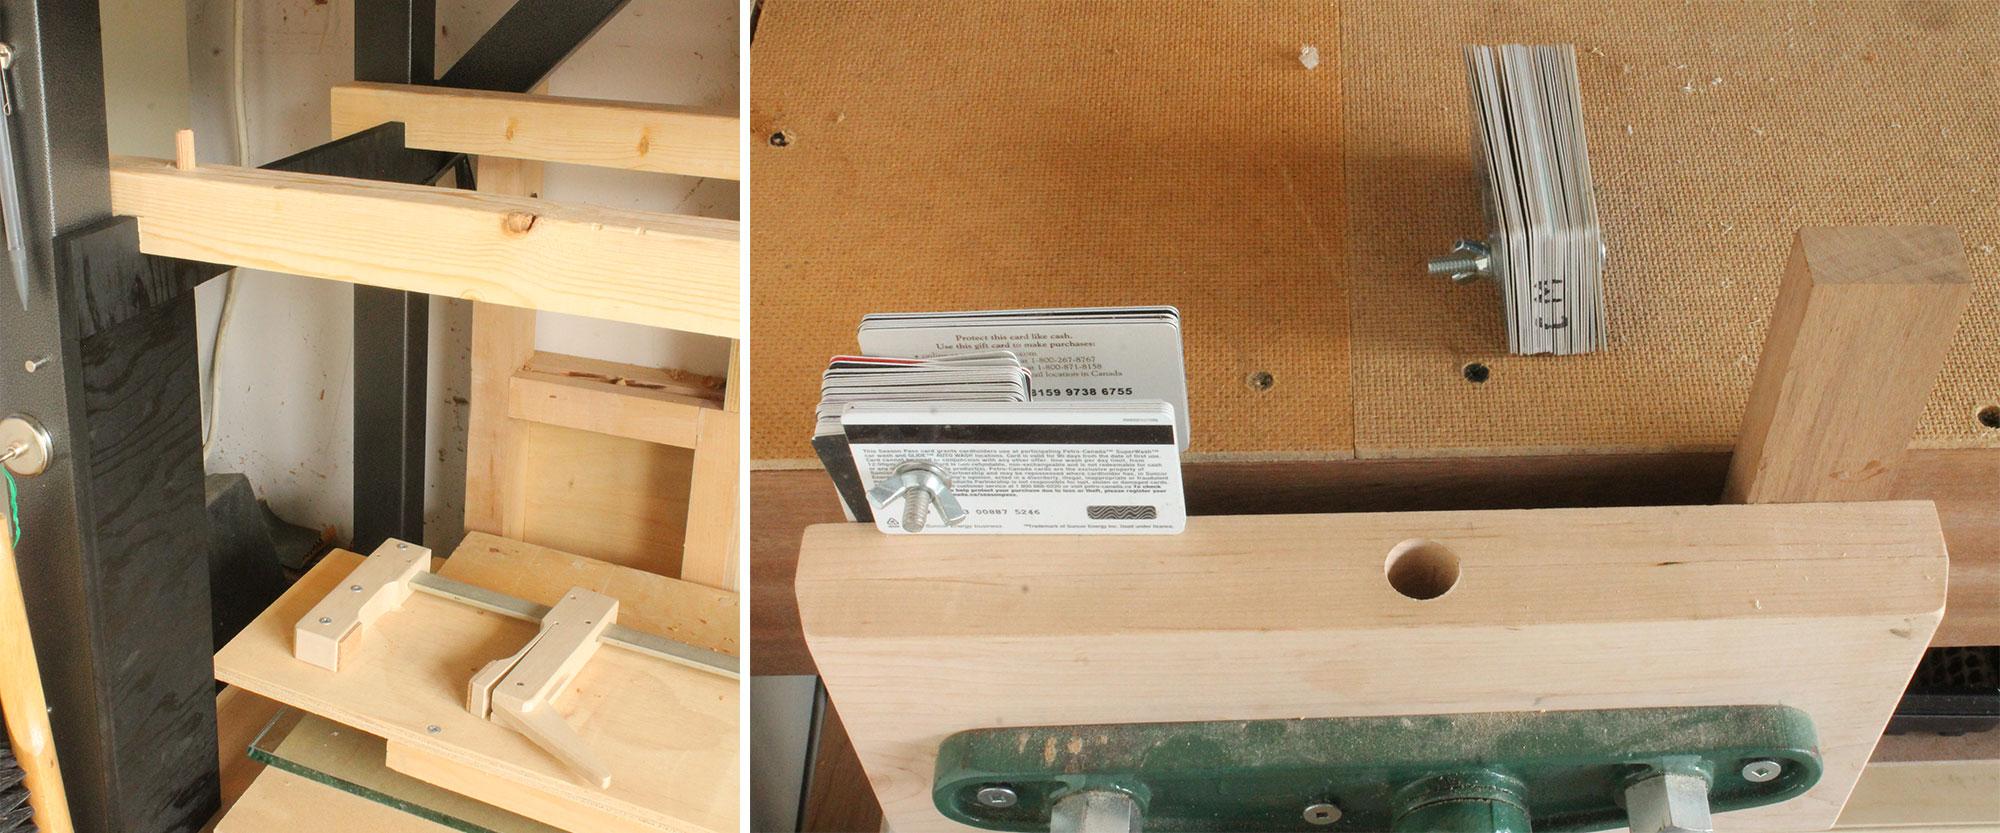 Left: Removable shelves. Right: Adjustable spacer.